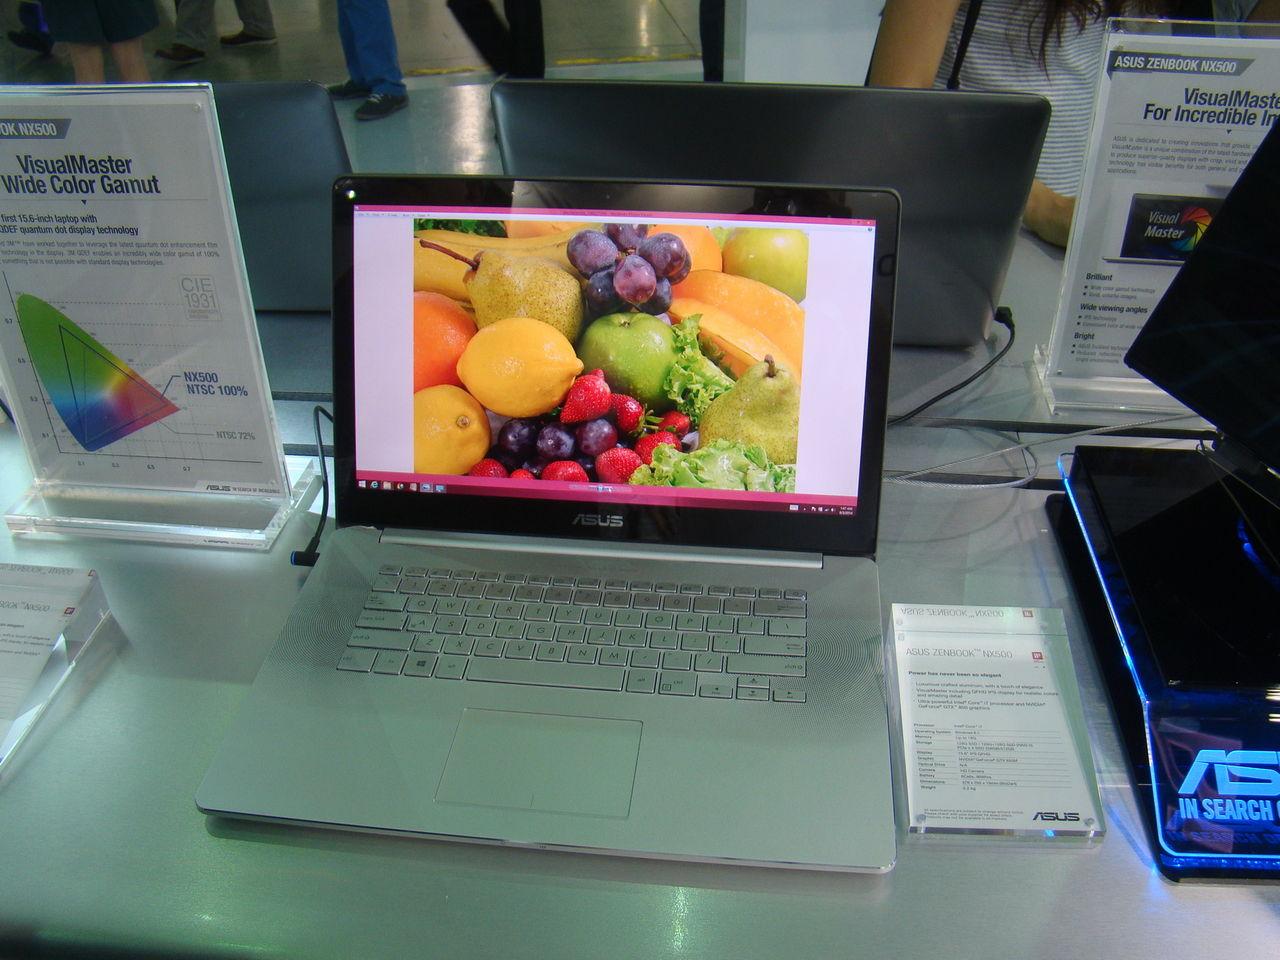 Asus lanserar Zenbook NX500